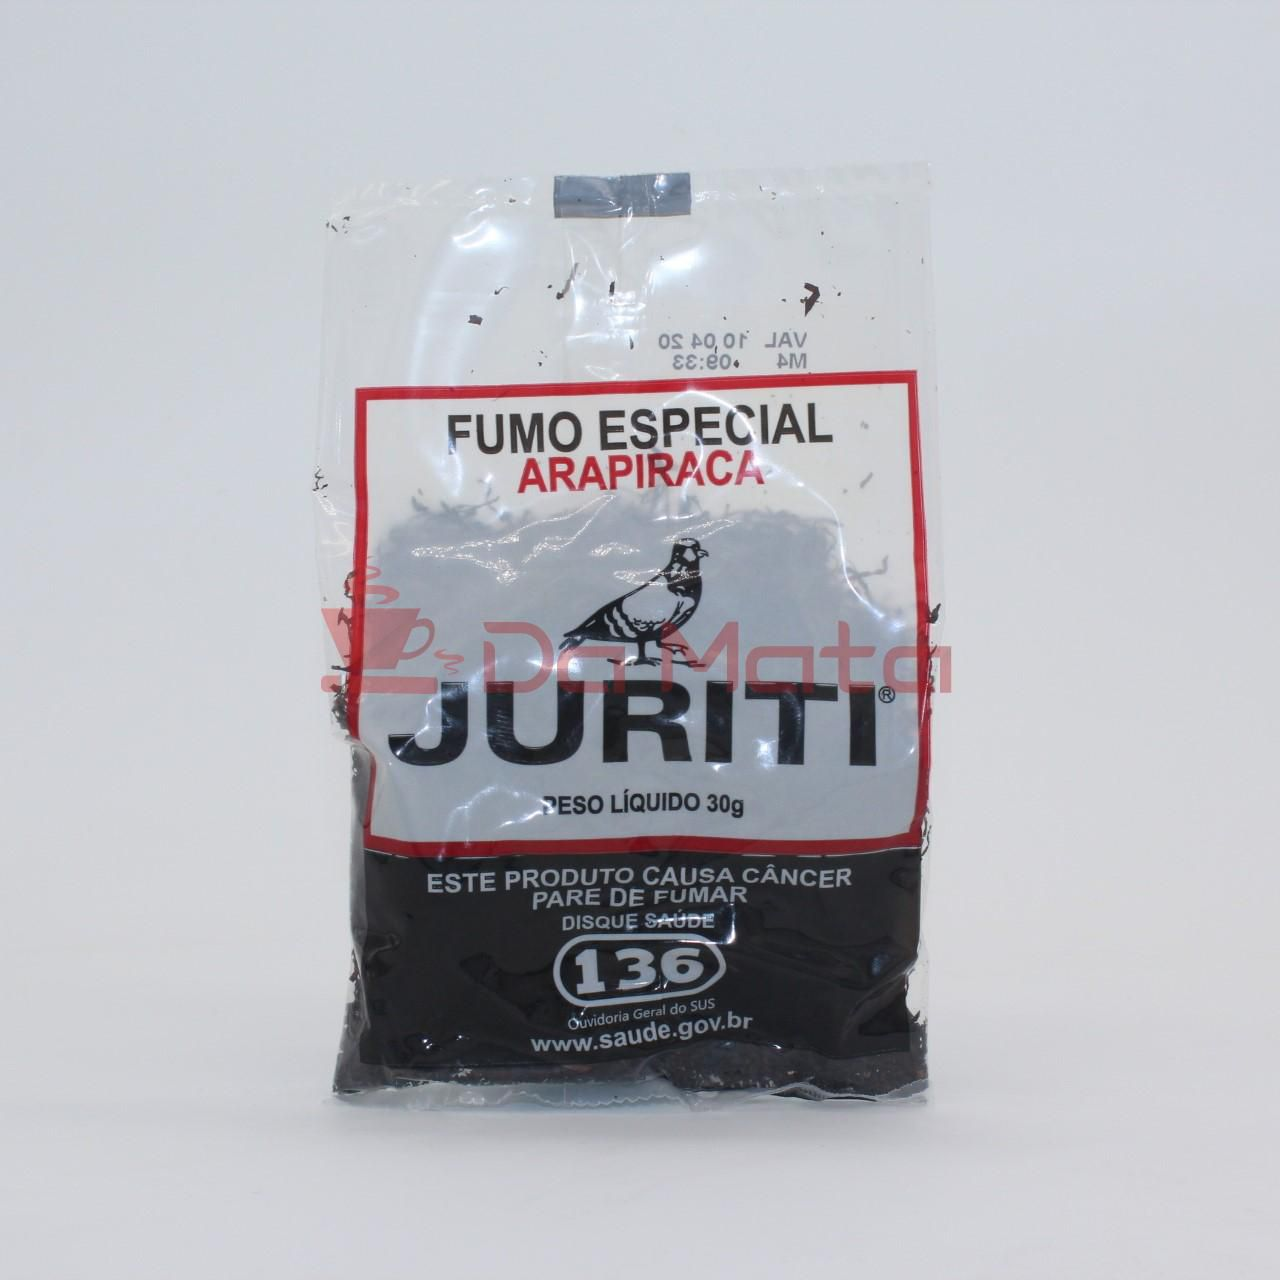 Fumo Especial Arapiraca - Juriti 30g